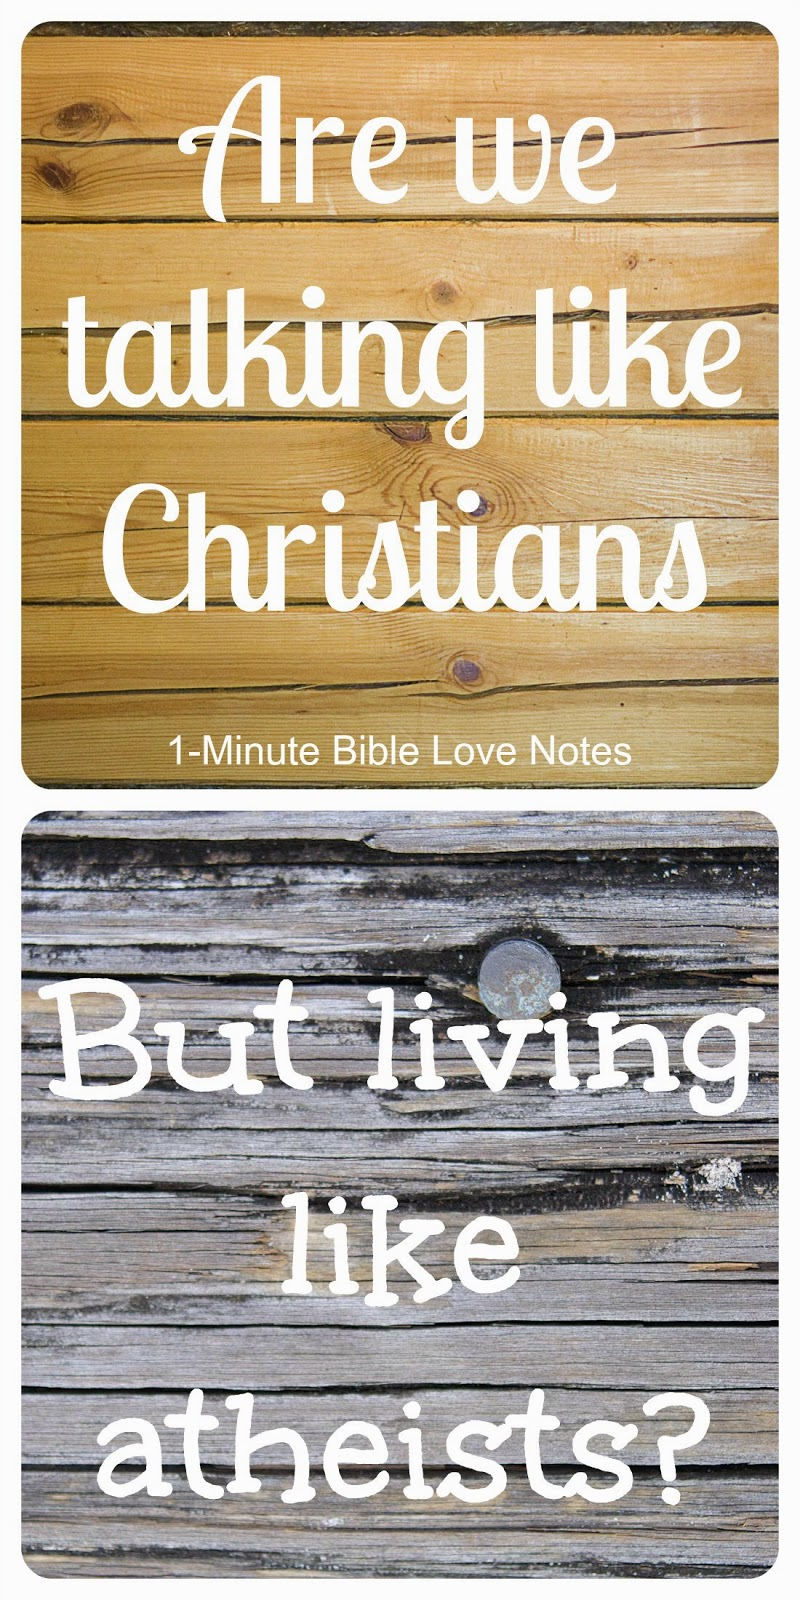 walking the walk, acting like a Christian